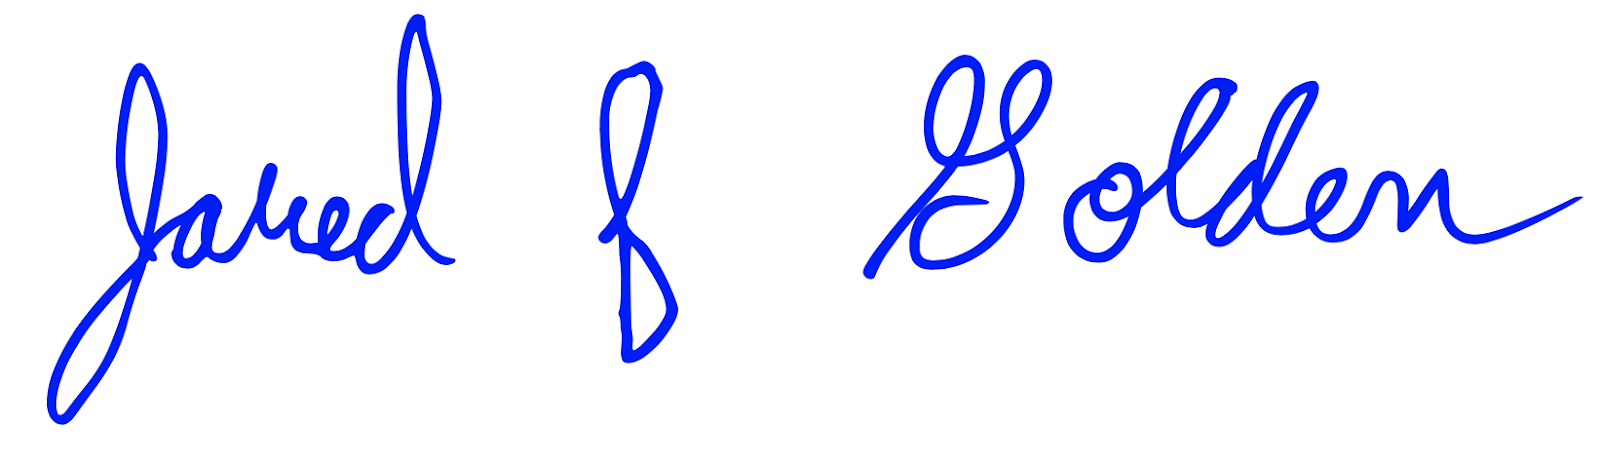 Congressman Golden's signature.